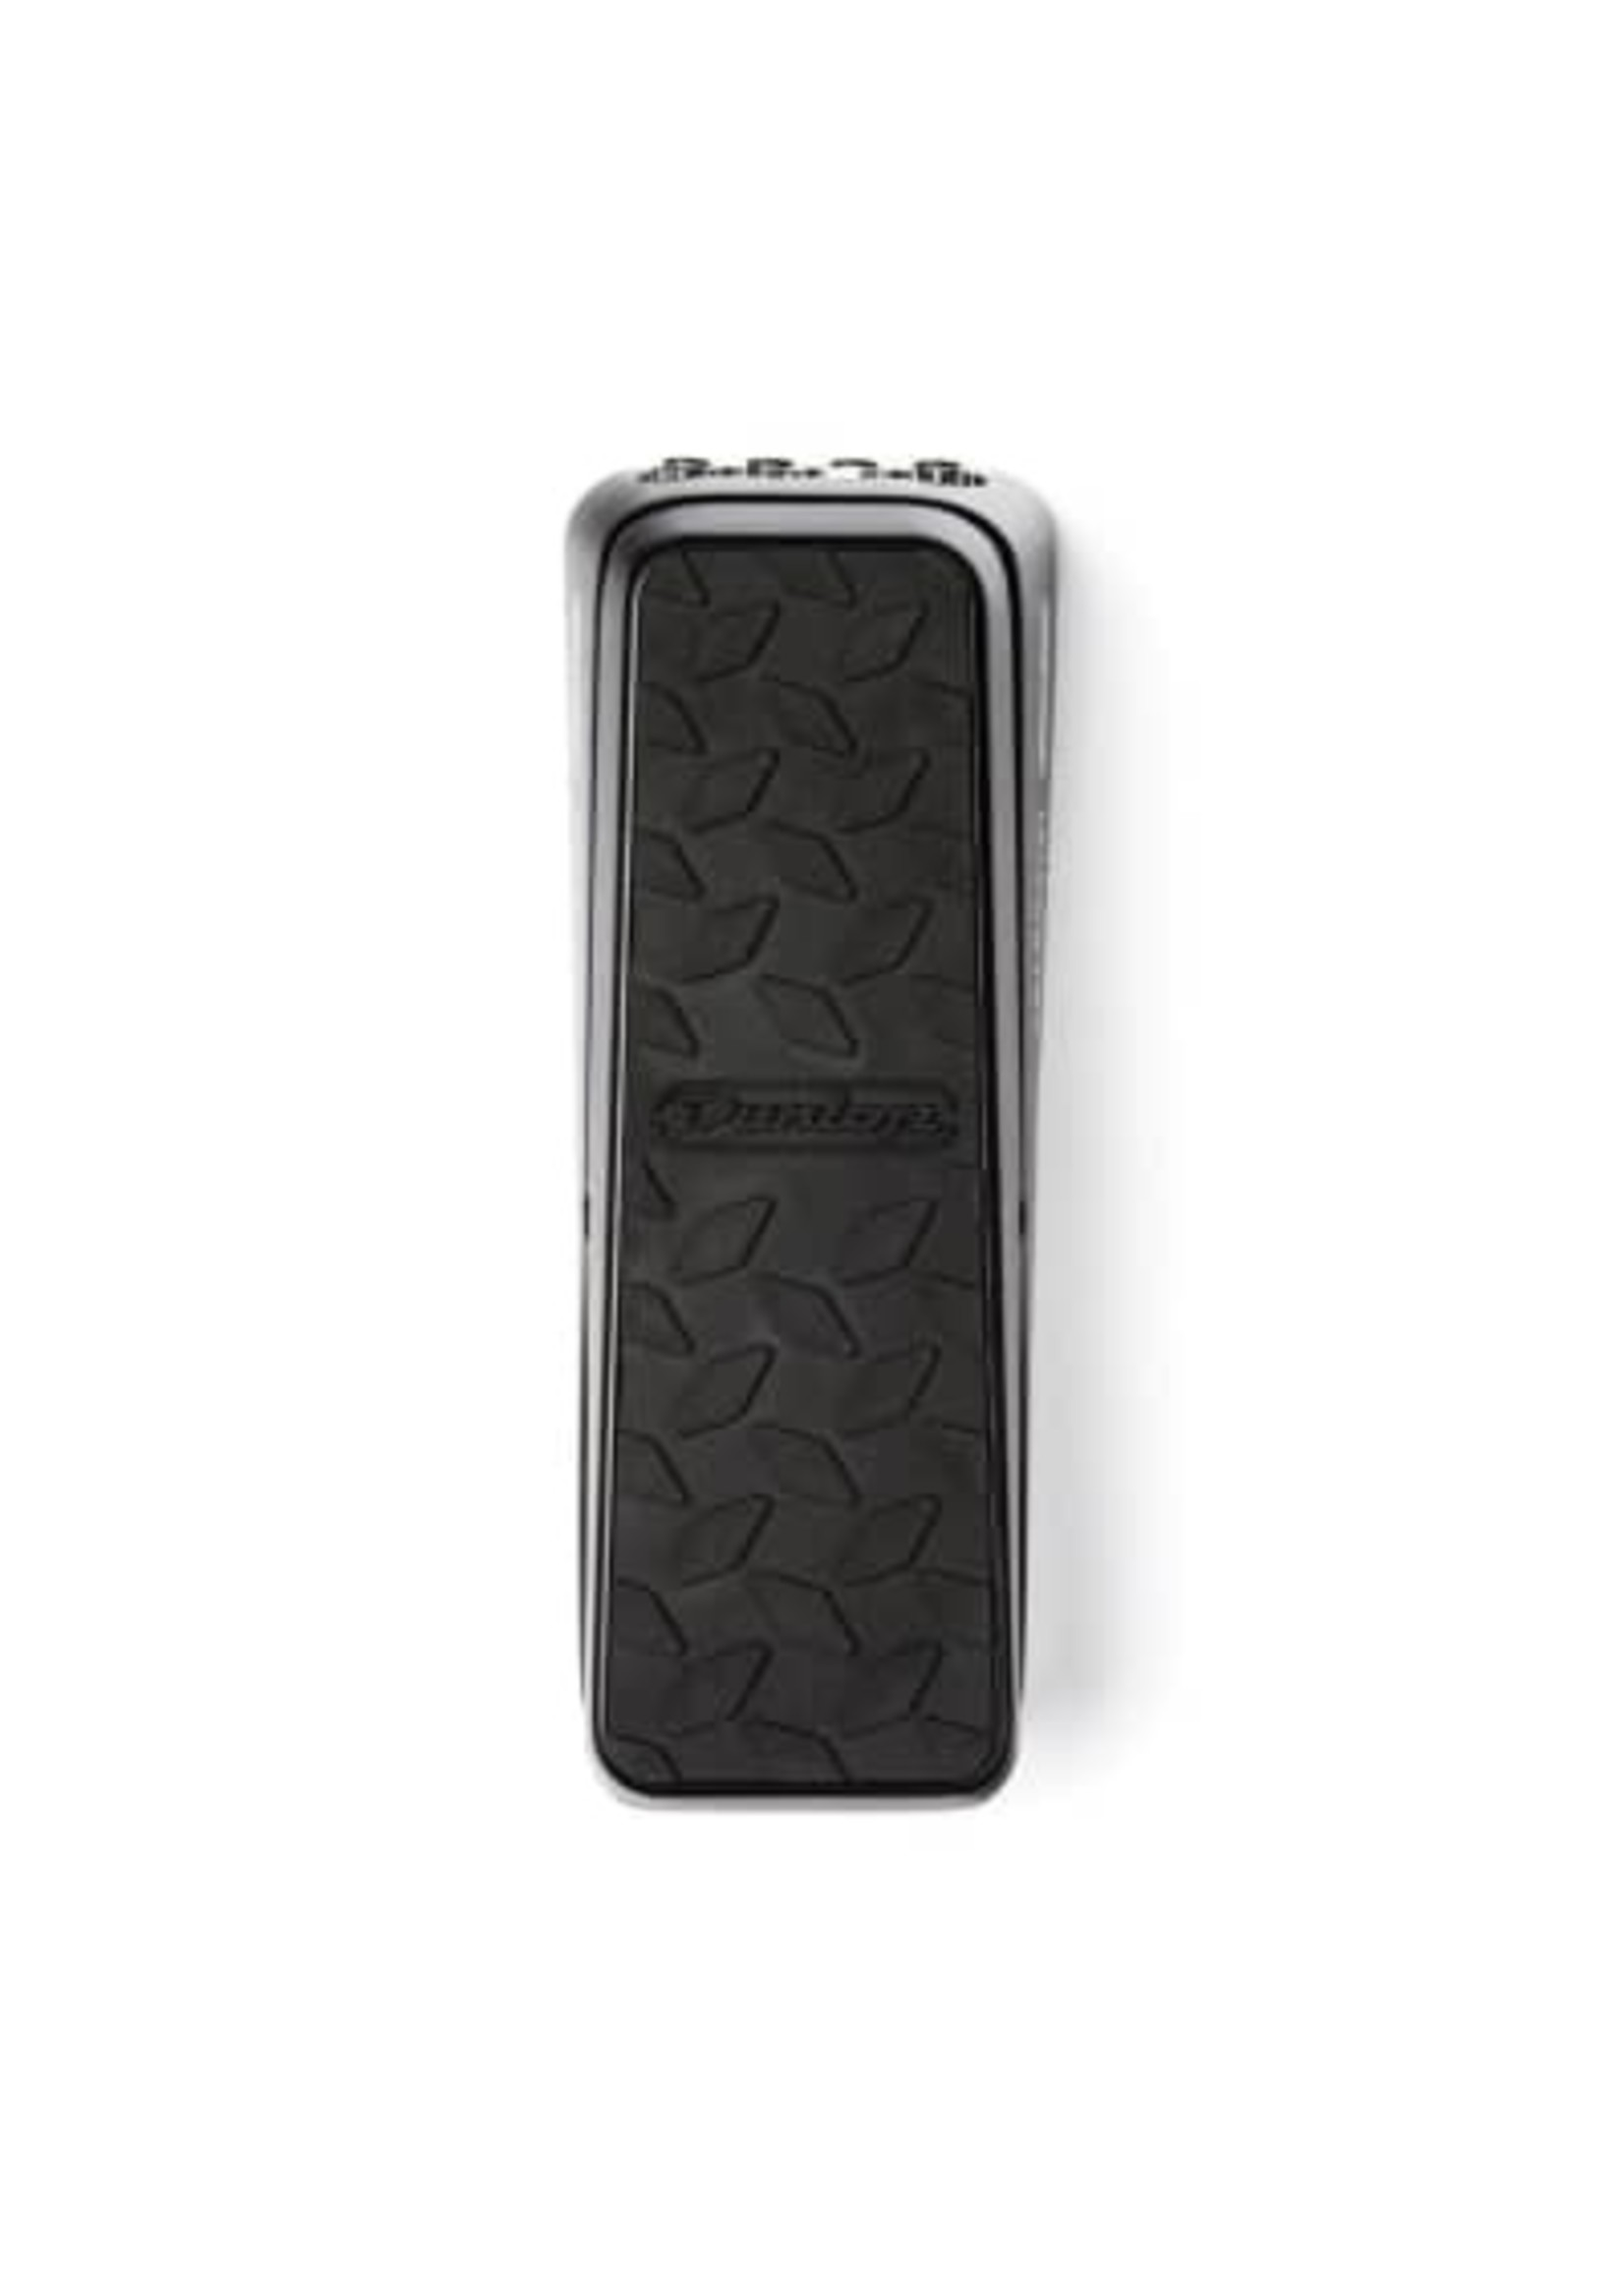 Dunlop Dunlop DVP3 Volume X Pedal